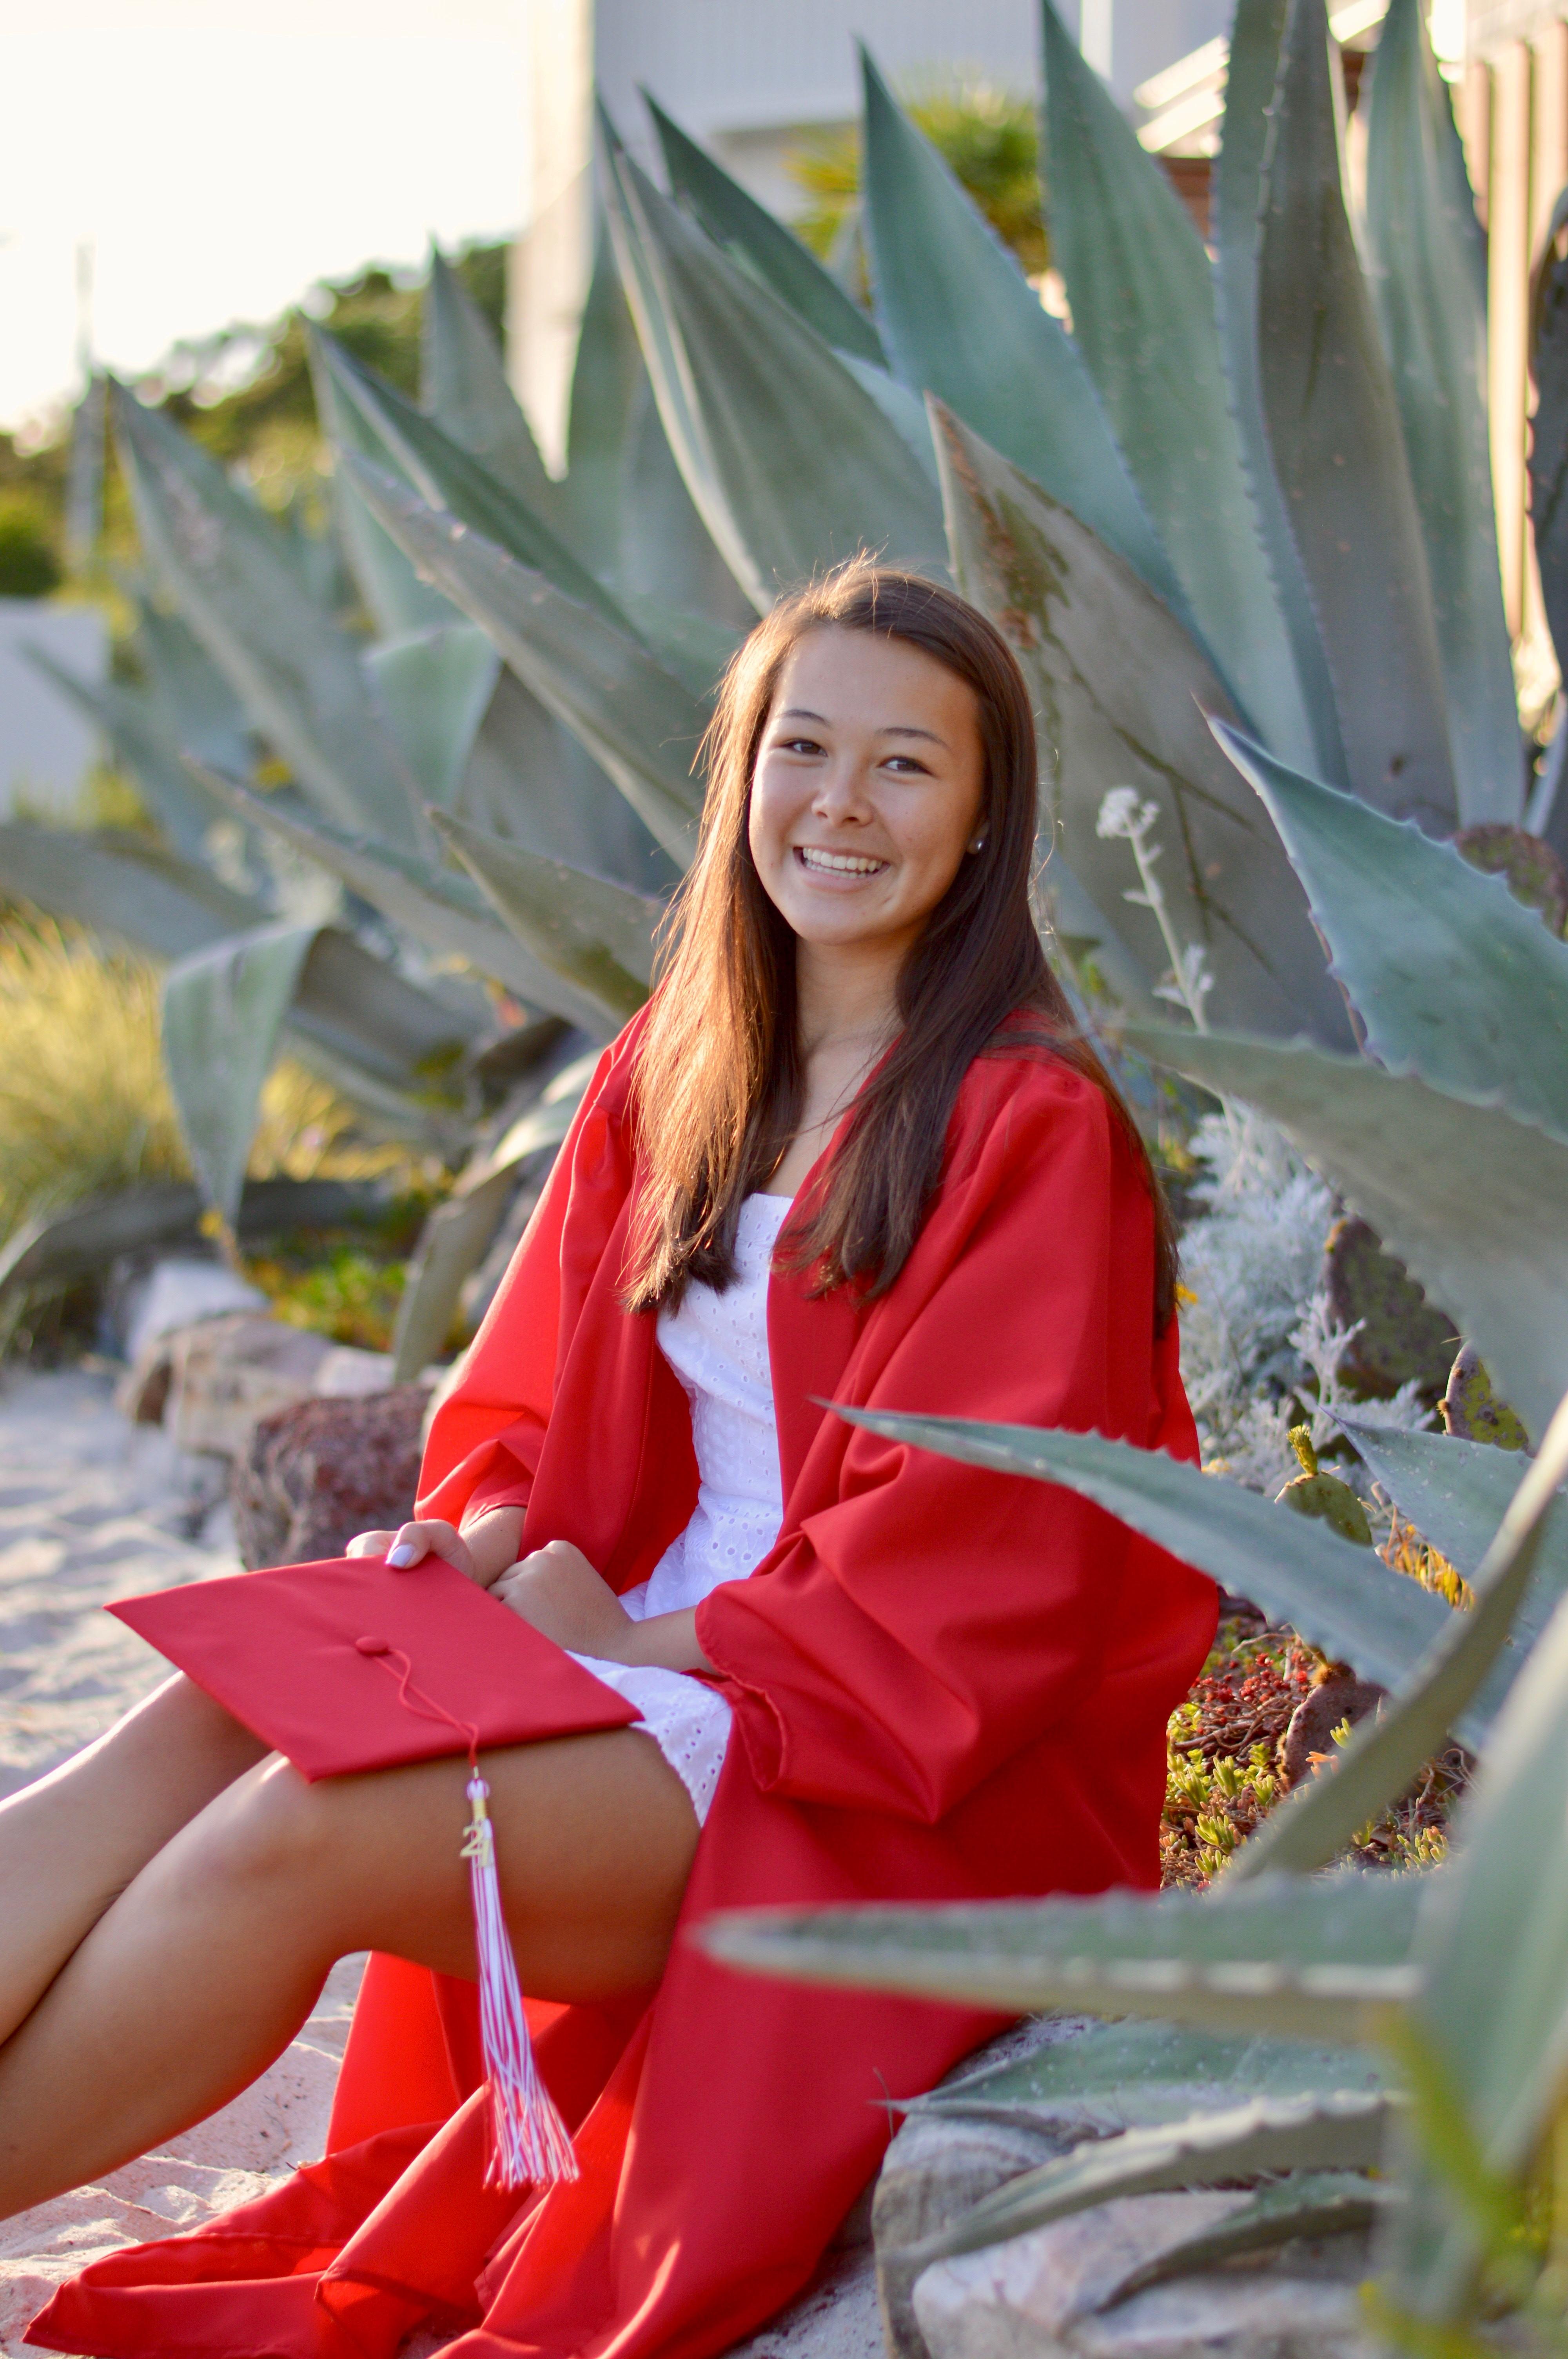 Union Academy graduate, Mya Manivanh, in red graduation gown.